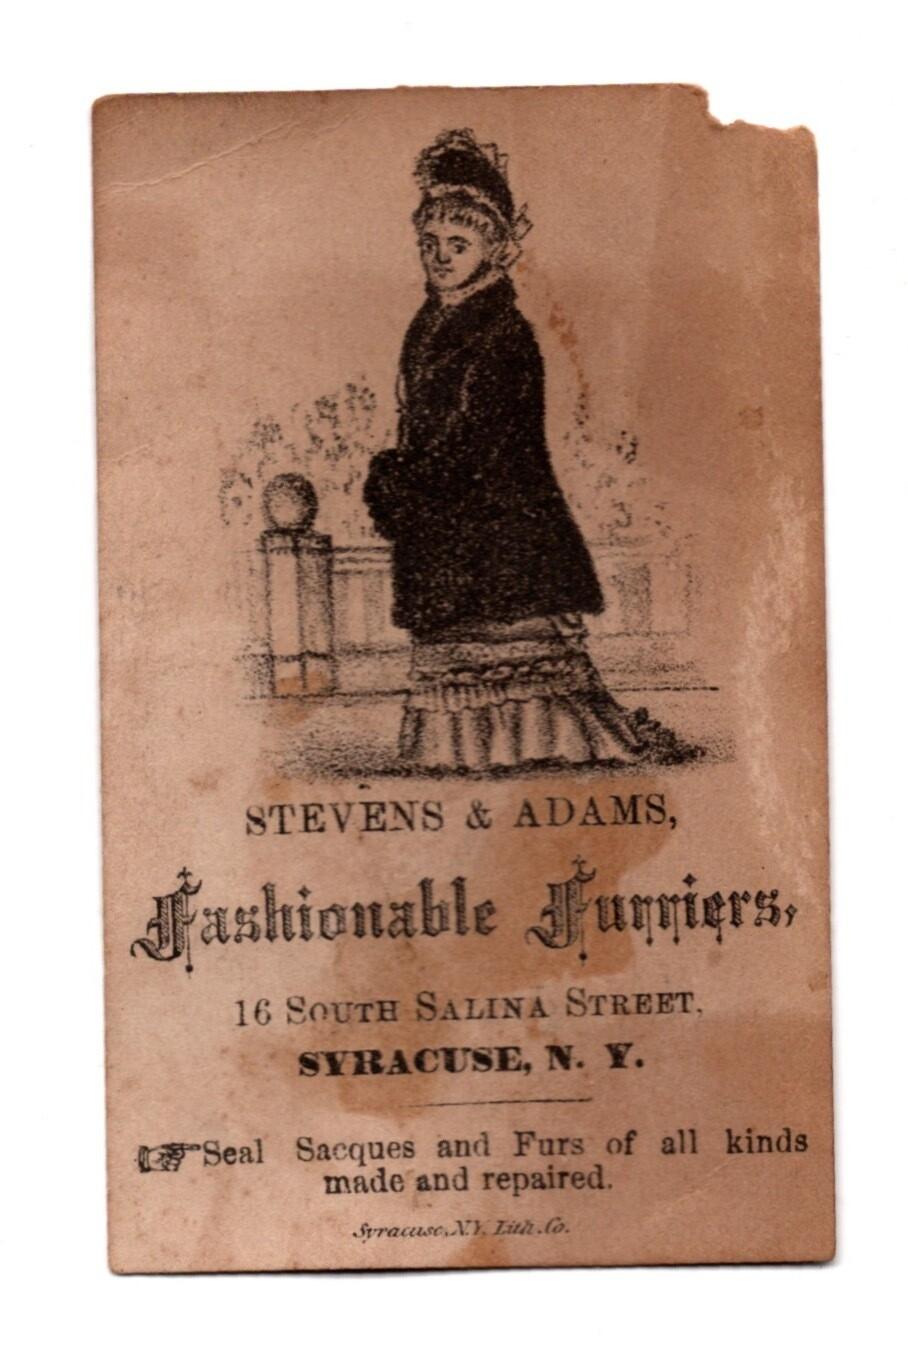 Stevens & Adams Fashionable Furriers Trade